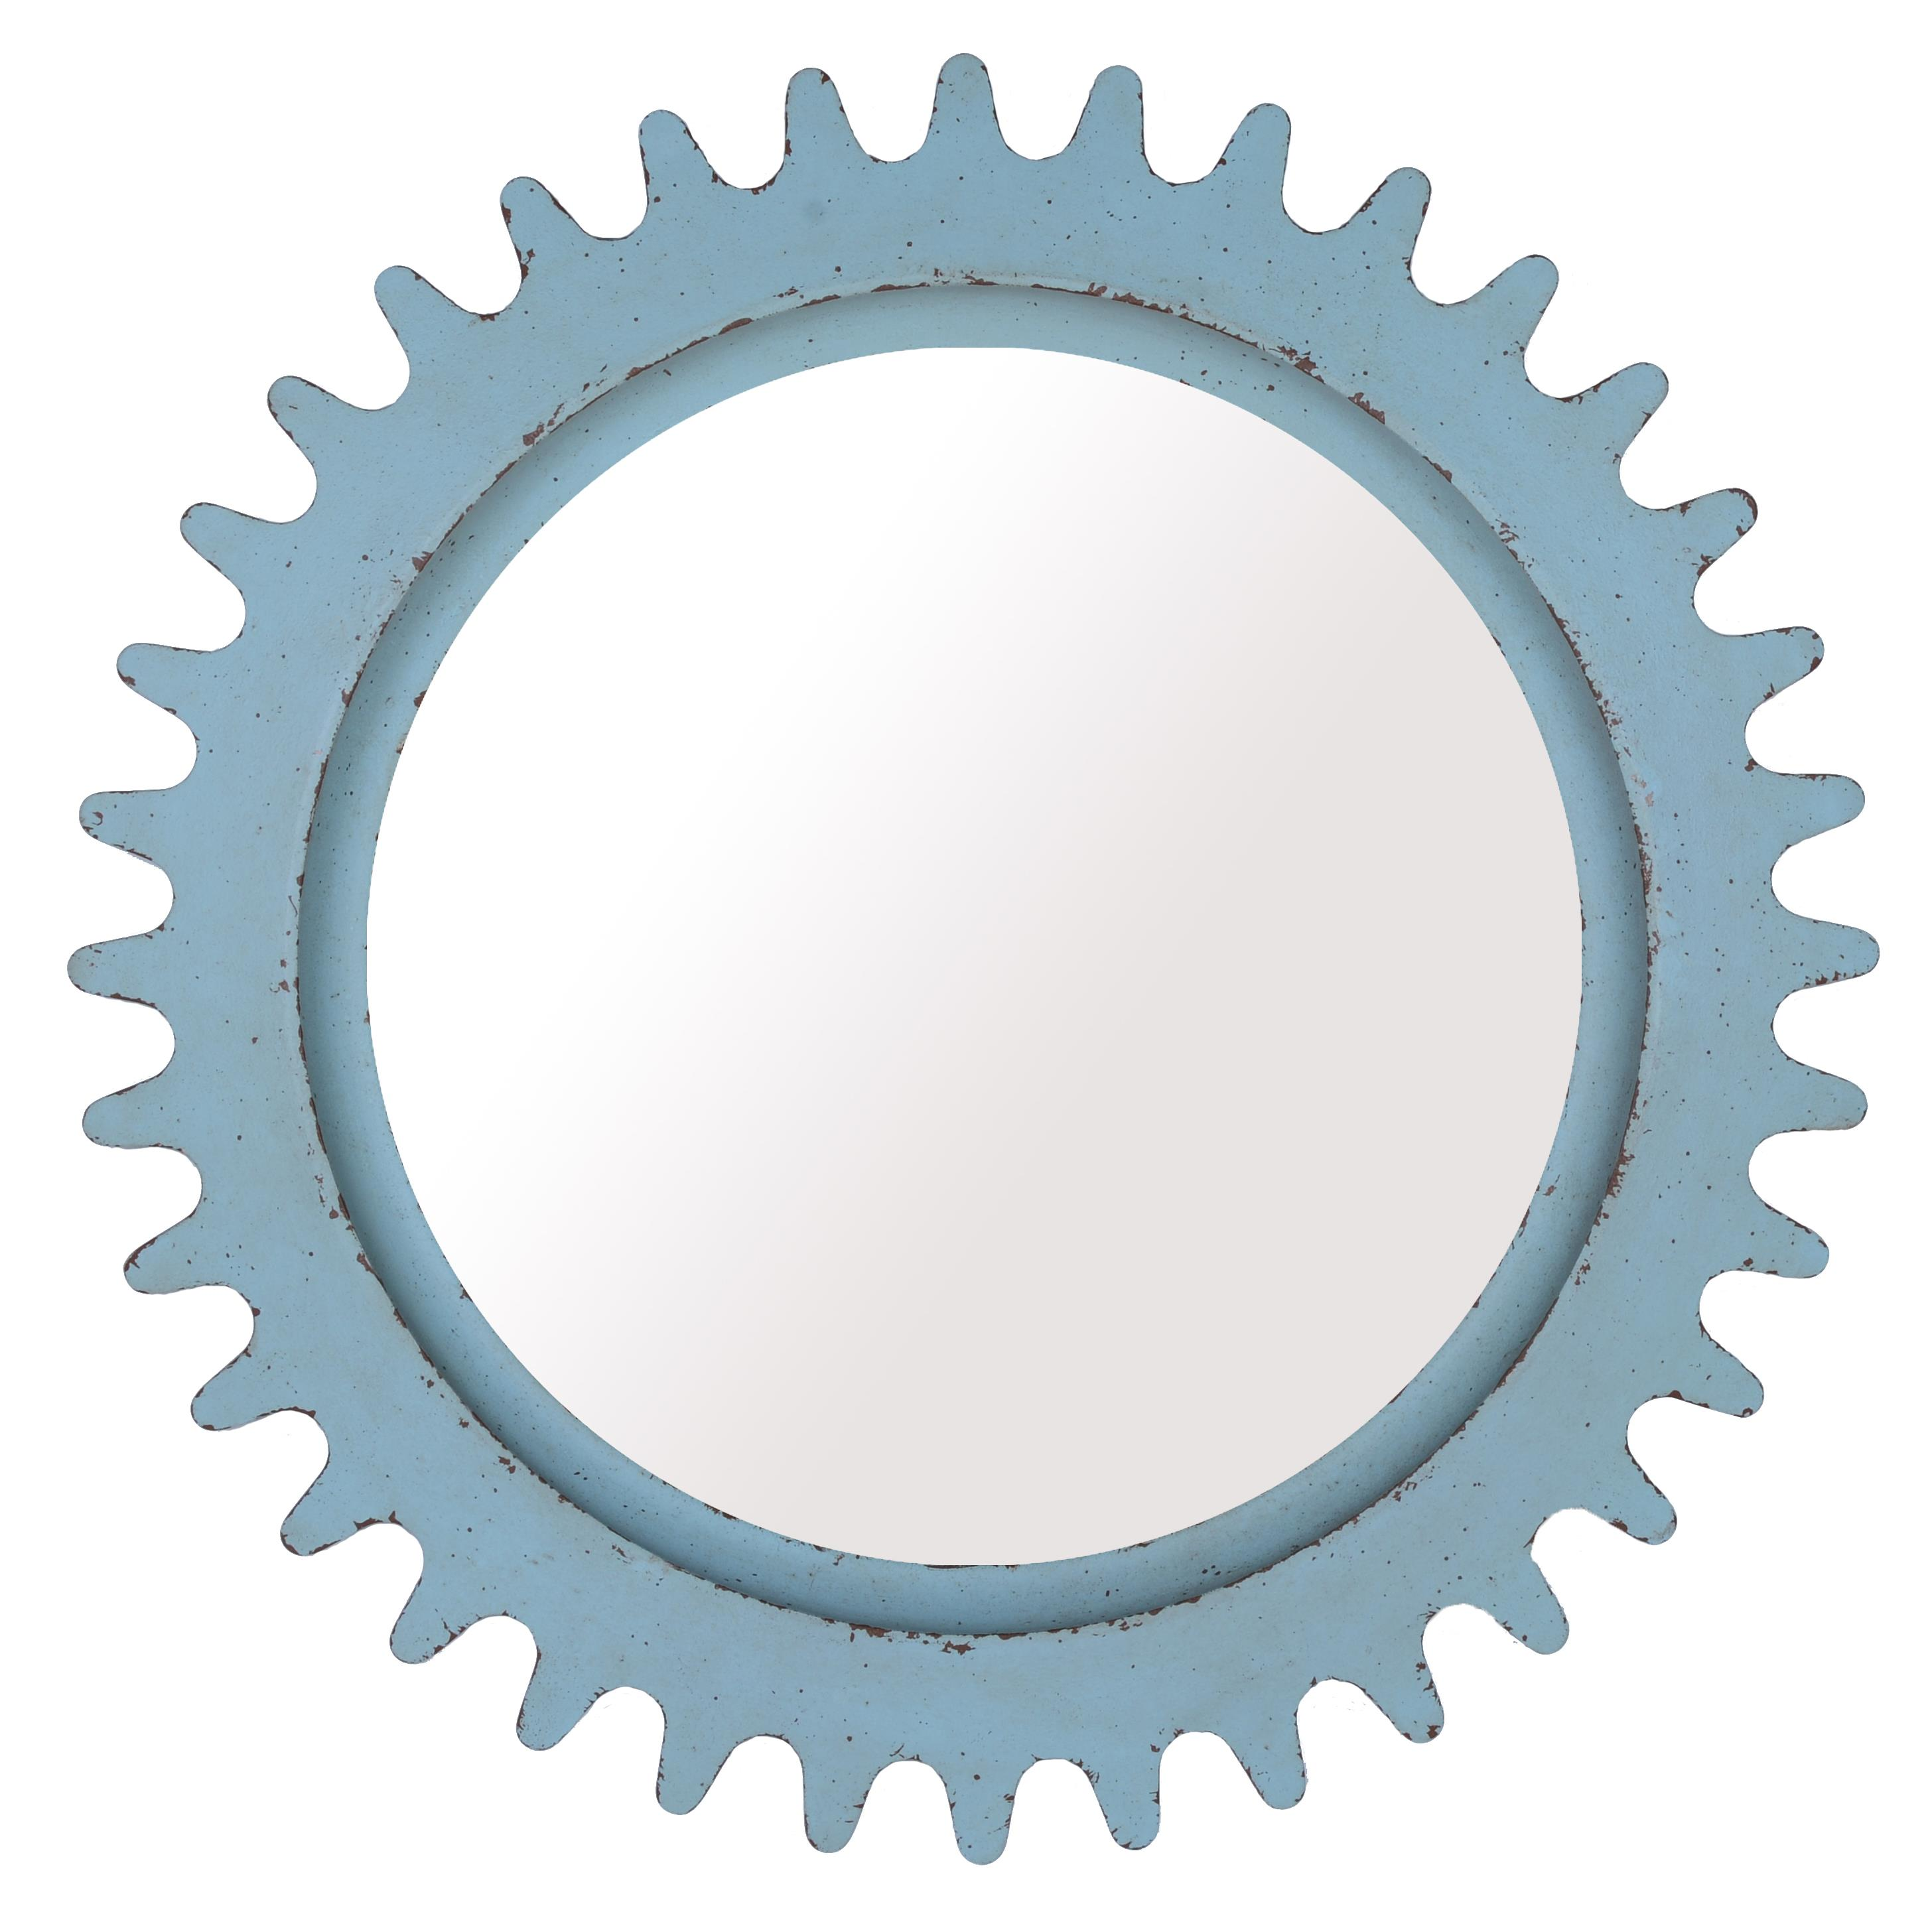 Belfort Signature Urban Treasures Shaw Round Factory Mirror - Item Number: 223122-2621